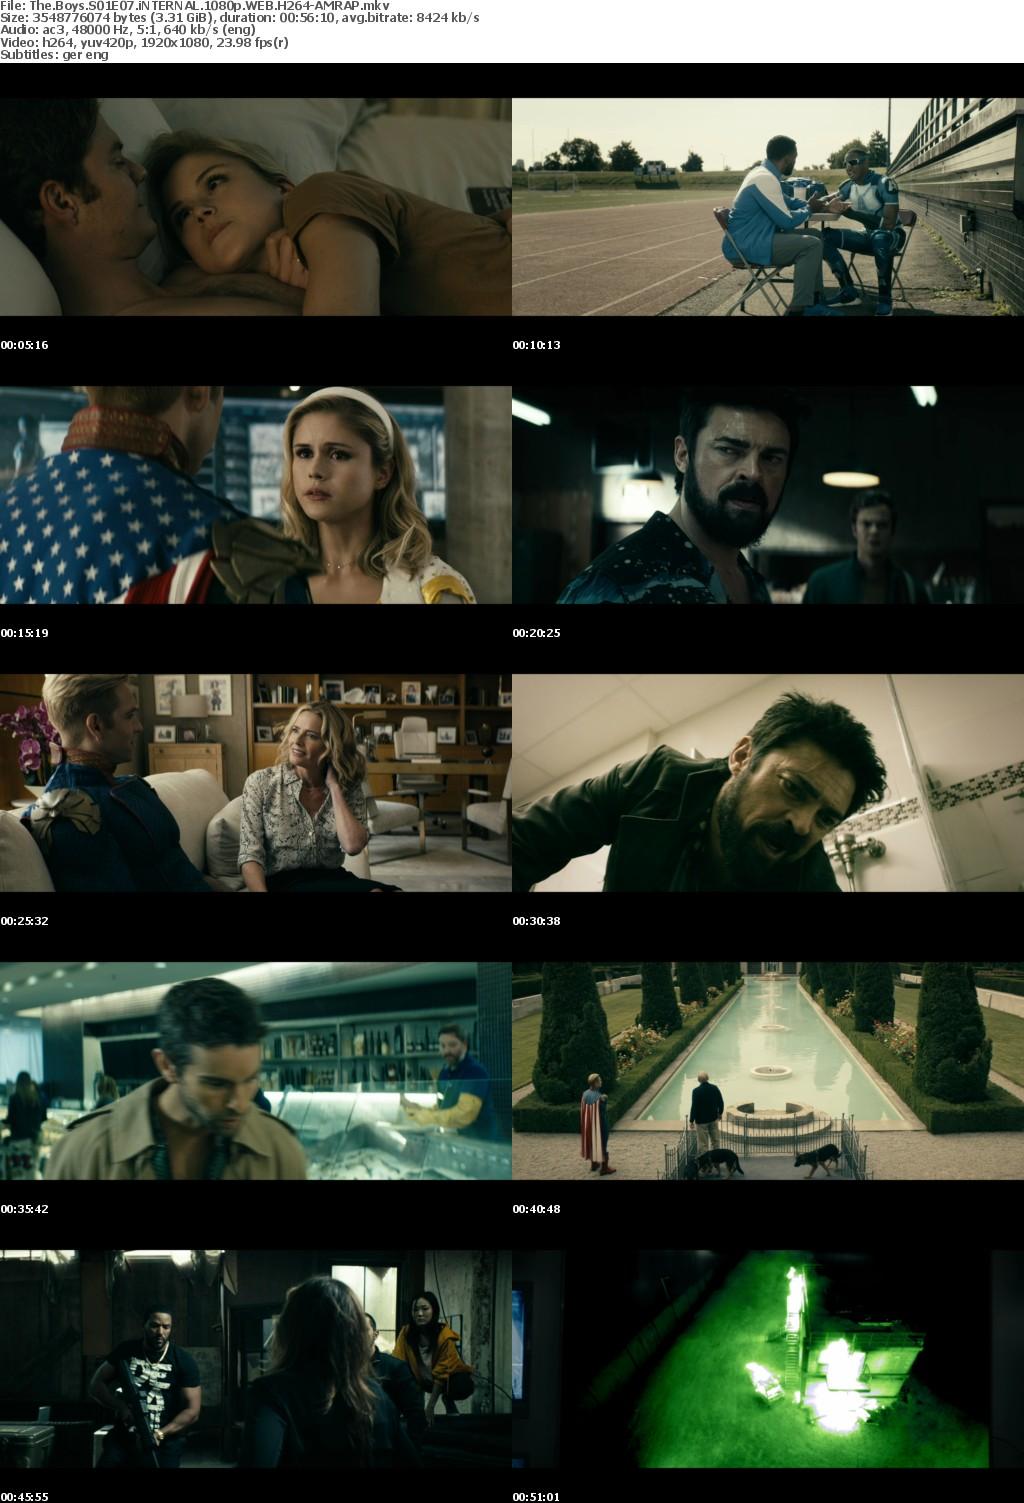 The Boys S01E07 iNTERNAL 1080p WEB H264-AMRAP